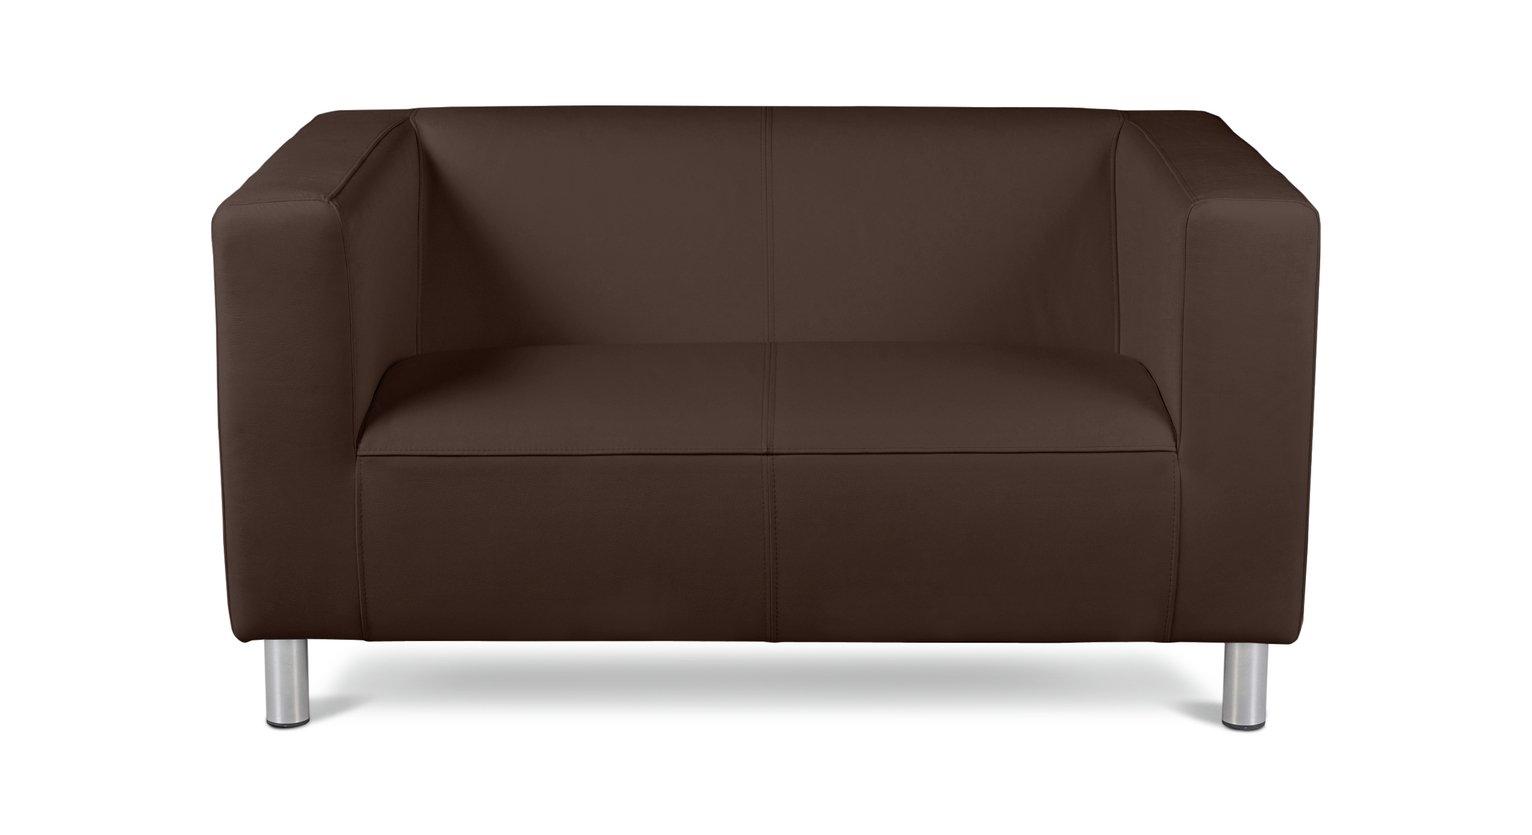 Habitat Moda Compact 2 Seater Faux Leather Sofa - Brown